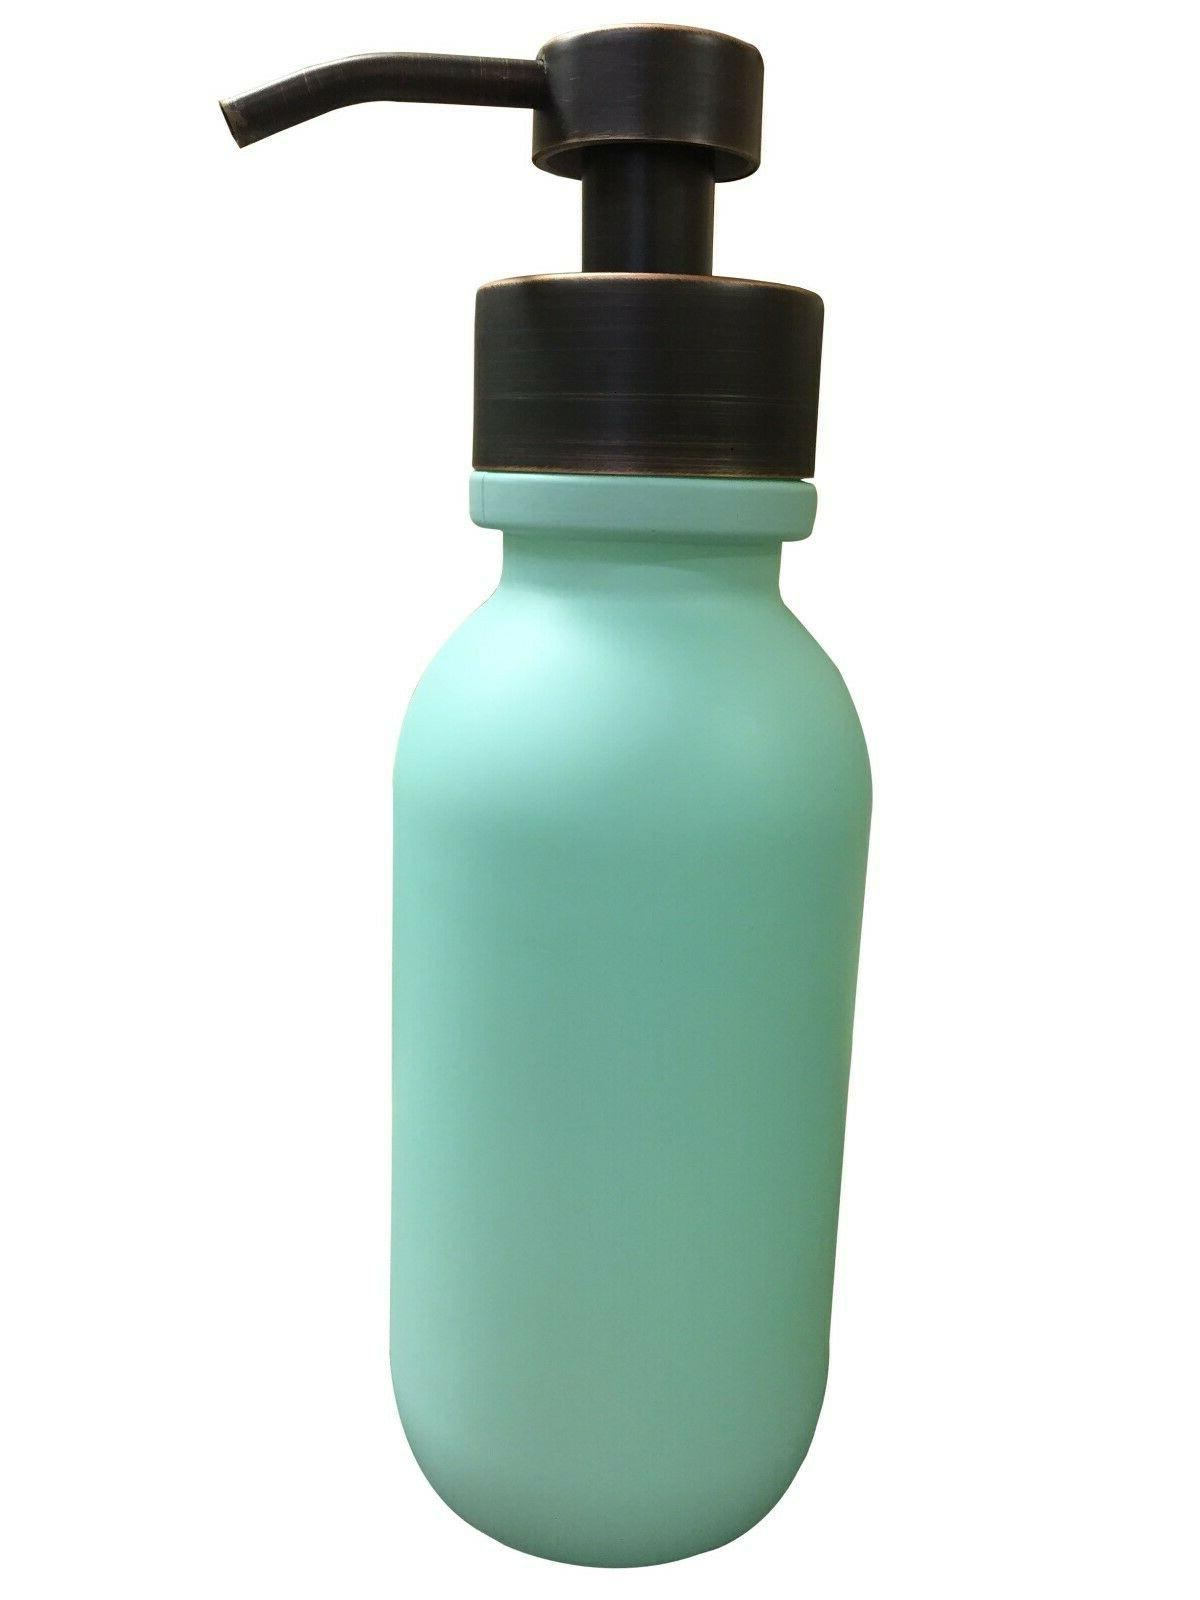 Seafoam Soap Dispenser,16oz Green Glass Bottle, Liquid Soap